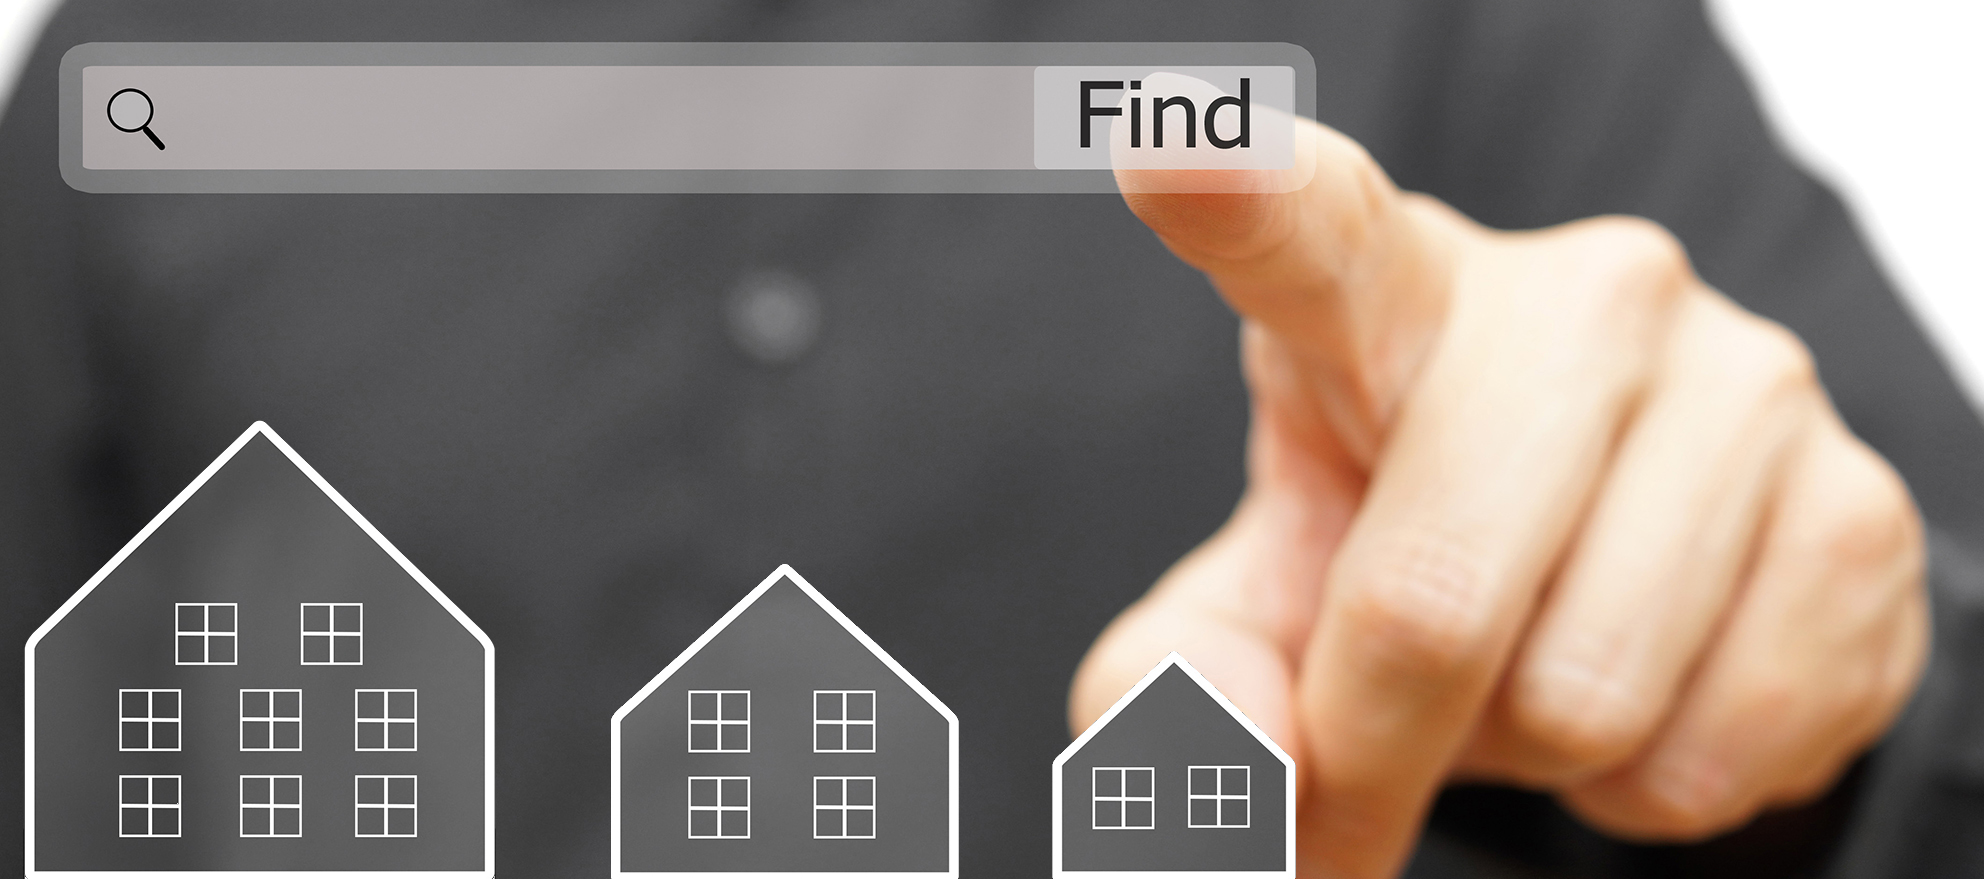 programmatic advertising target homebuyers online